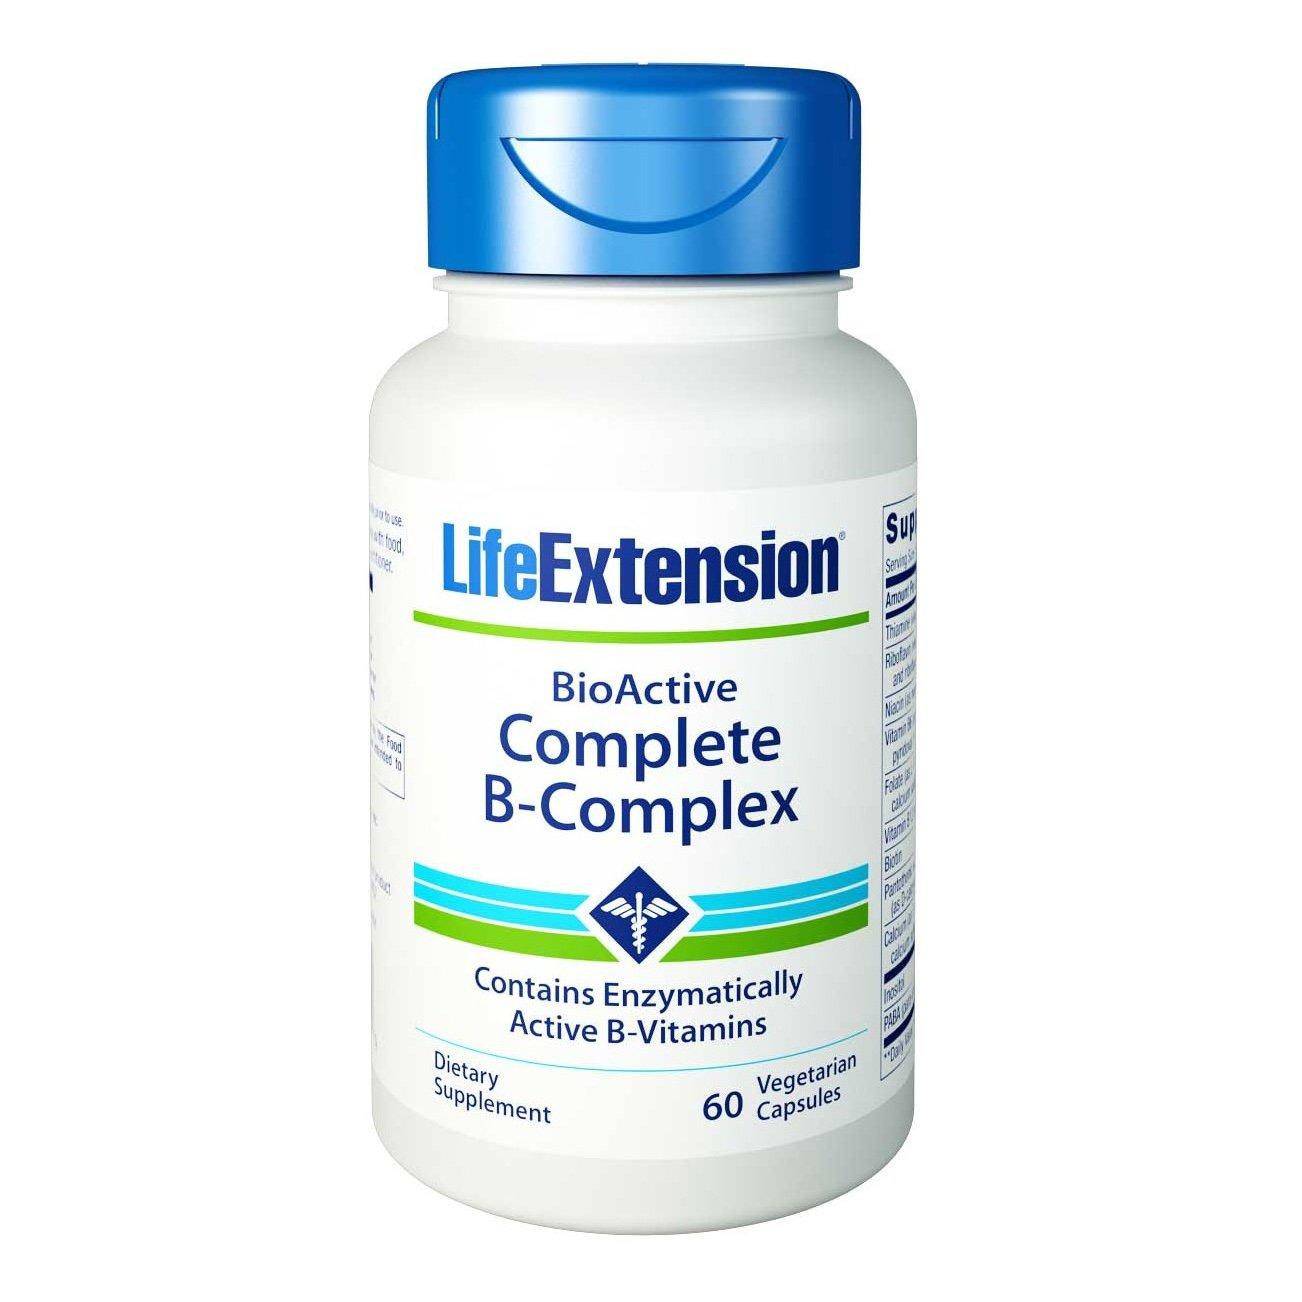 Life Extension Bio Active Complete B-Complex Συμπλήρωμα Διατροφής Βιταμινών του Συμπλέγματος Β 60veg.caps